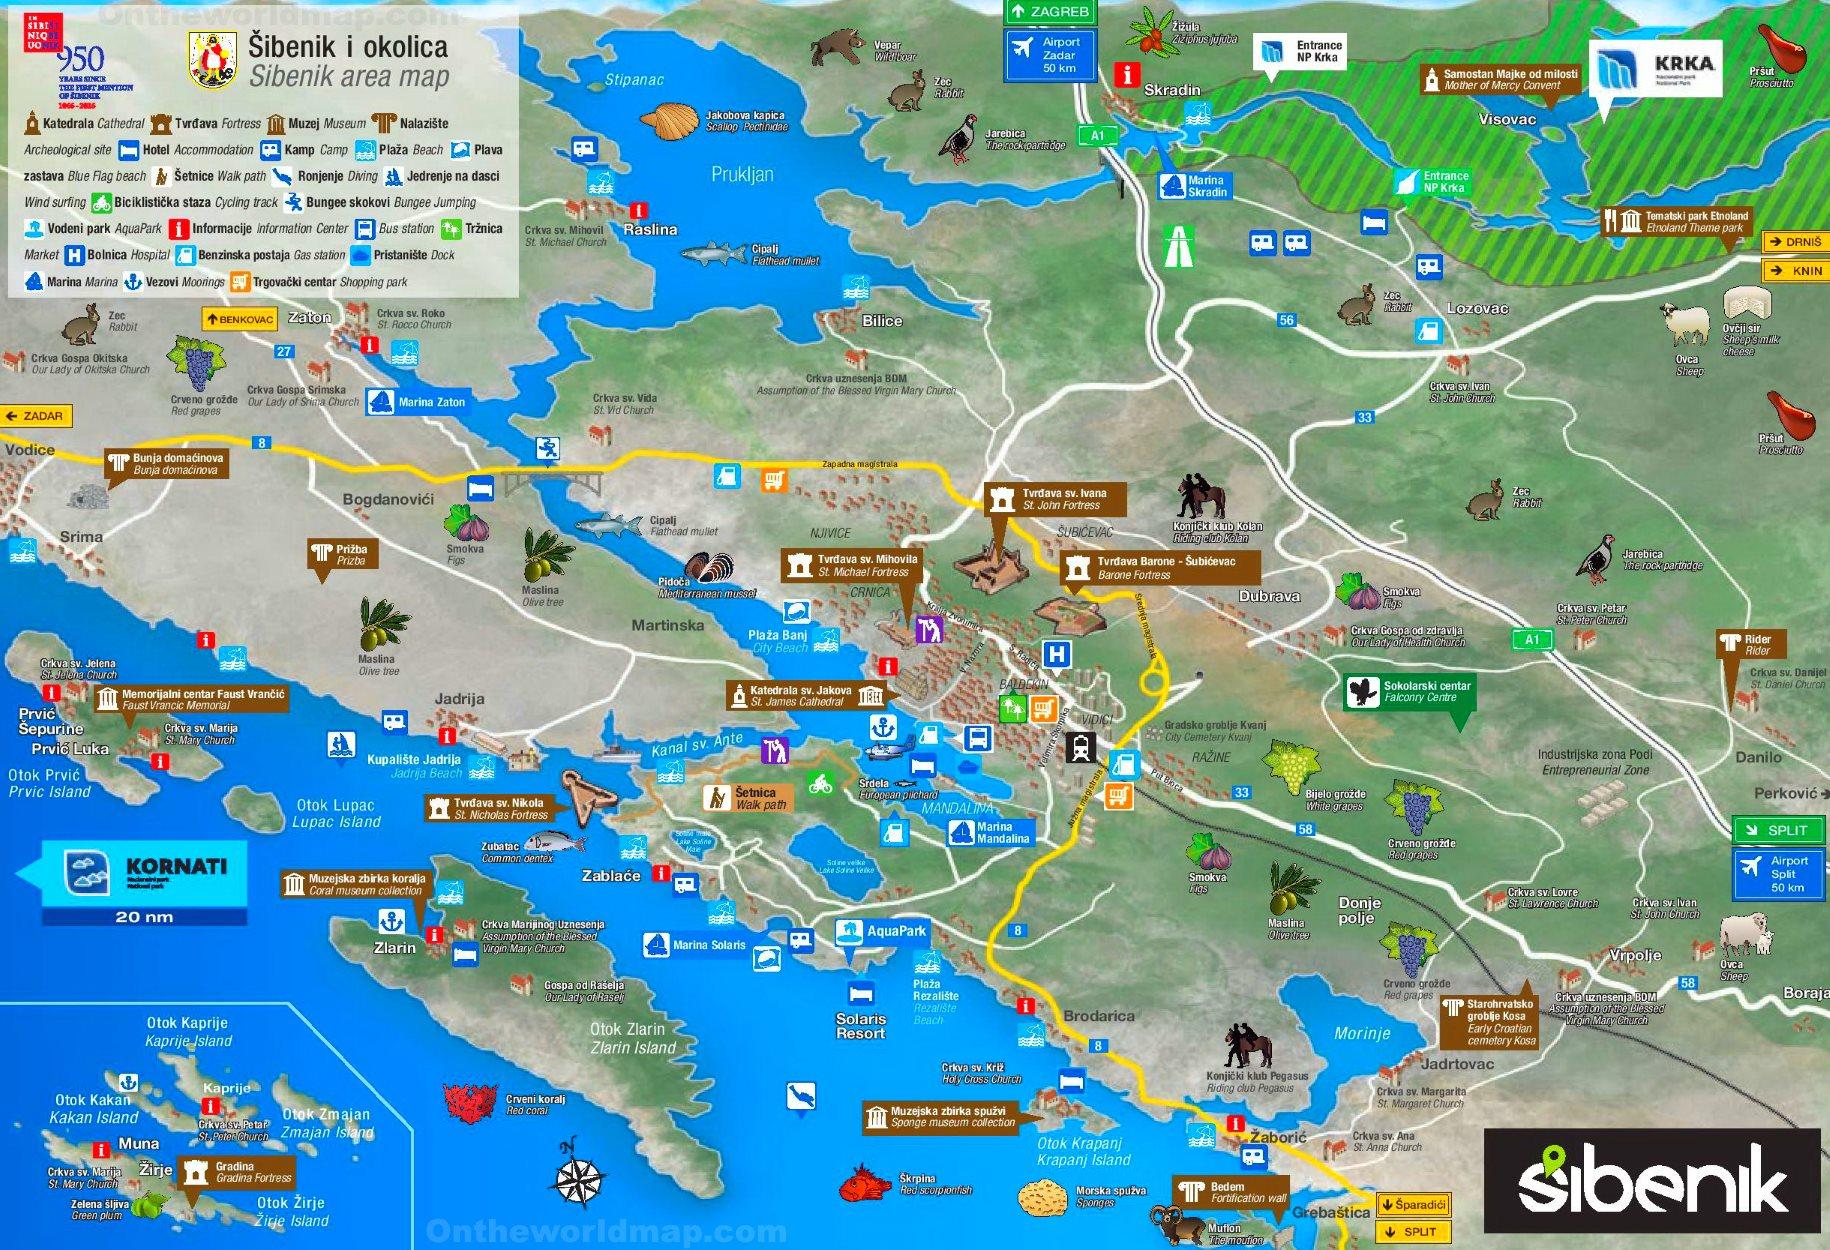 tourist-map-of-surroundings-of-sibenik.jpg